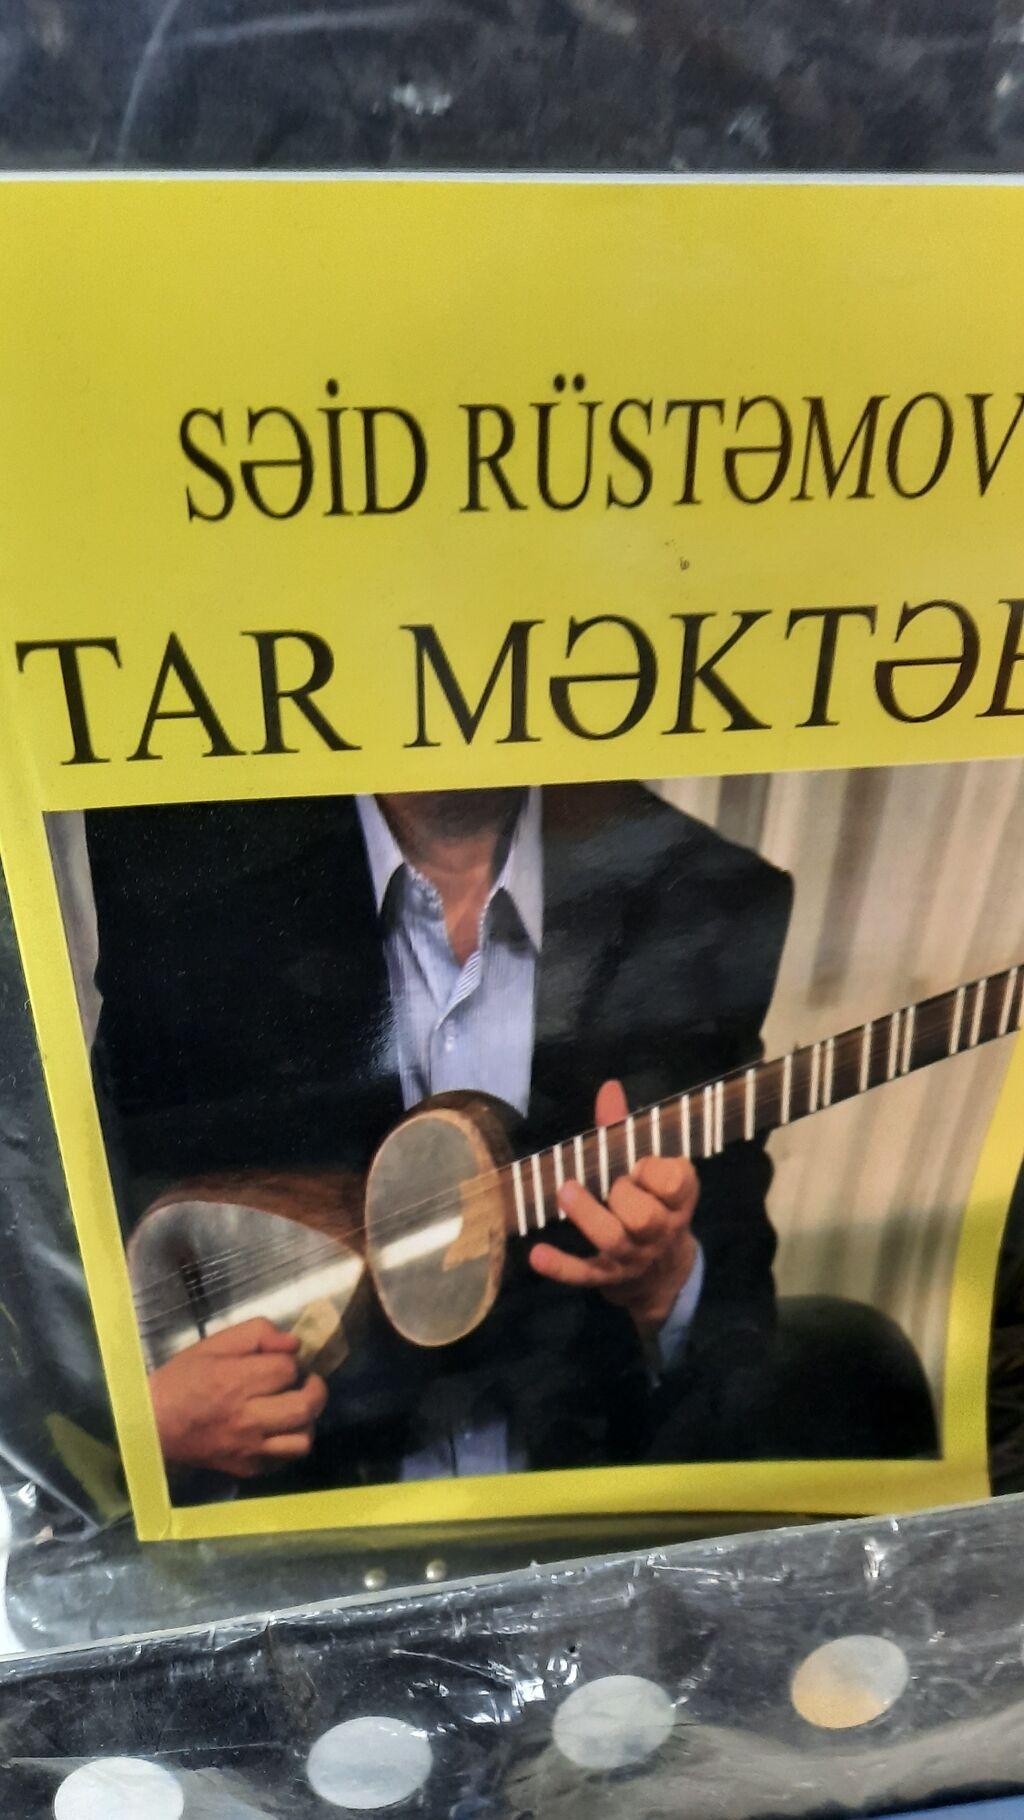 Tar mektebi Seyid Rustemov  Rast musiqi aletleri maģaza ùnvanalari   1: Tar mektebi Seyid Rustemov  Rast musiqi aletleri maģaza ùnvanalari   1